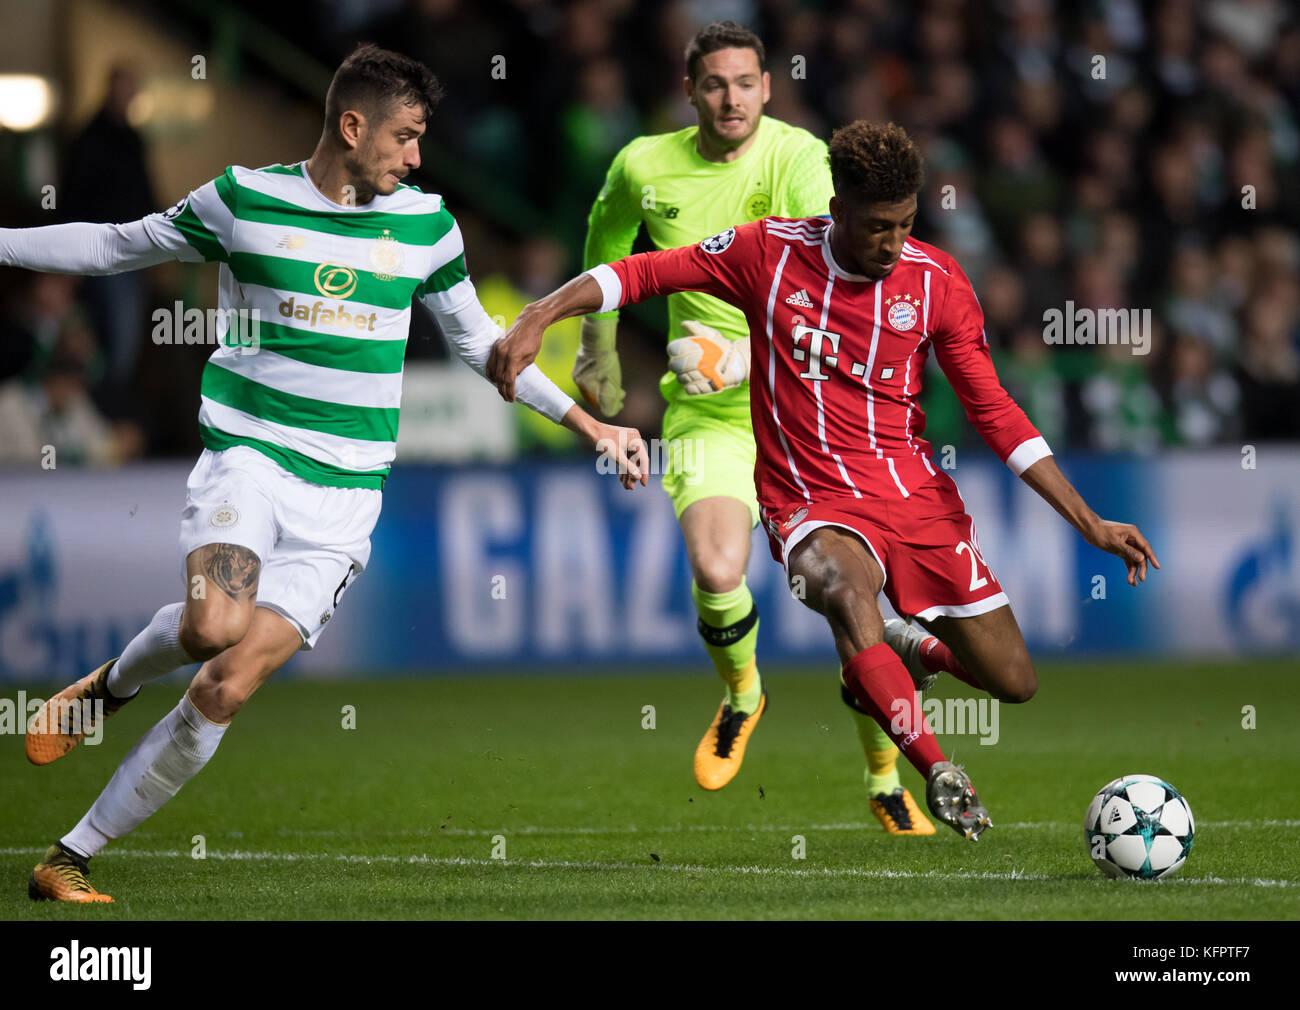 Glasgow, UK. 31st Oct, 2017. Bayern's Kingsley Coman (r) scores to make it 0:1, Nir Bitton (l) and goalie Craig - Stock Image